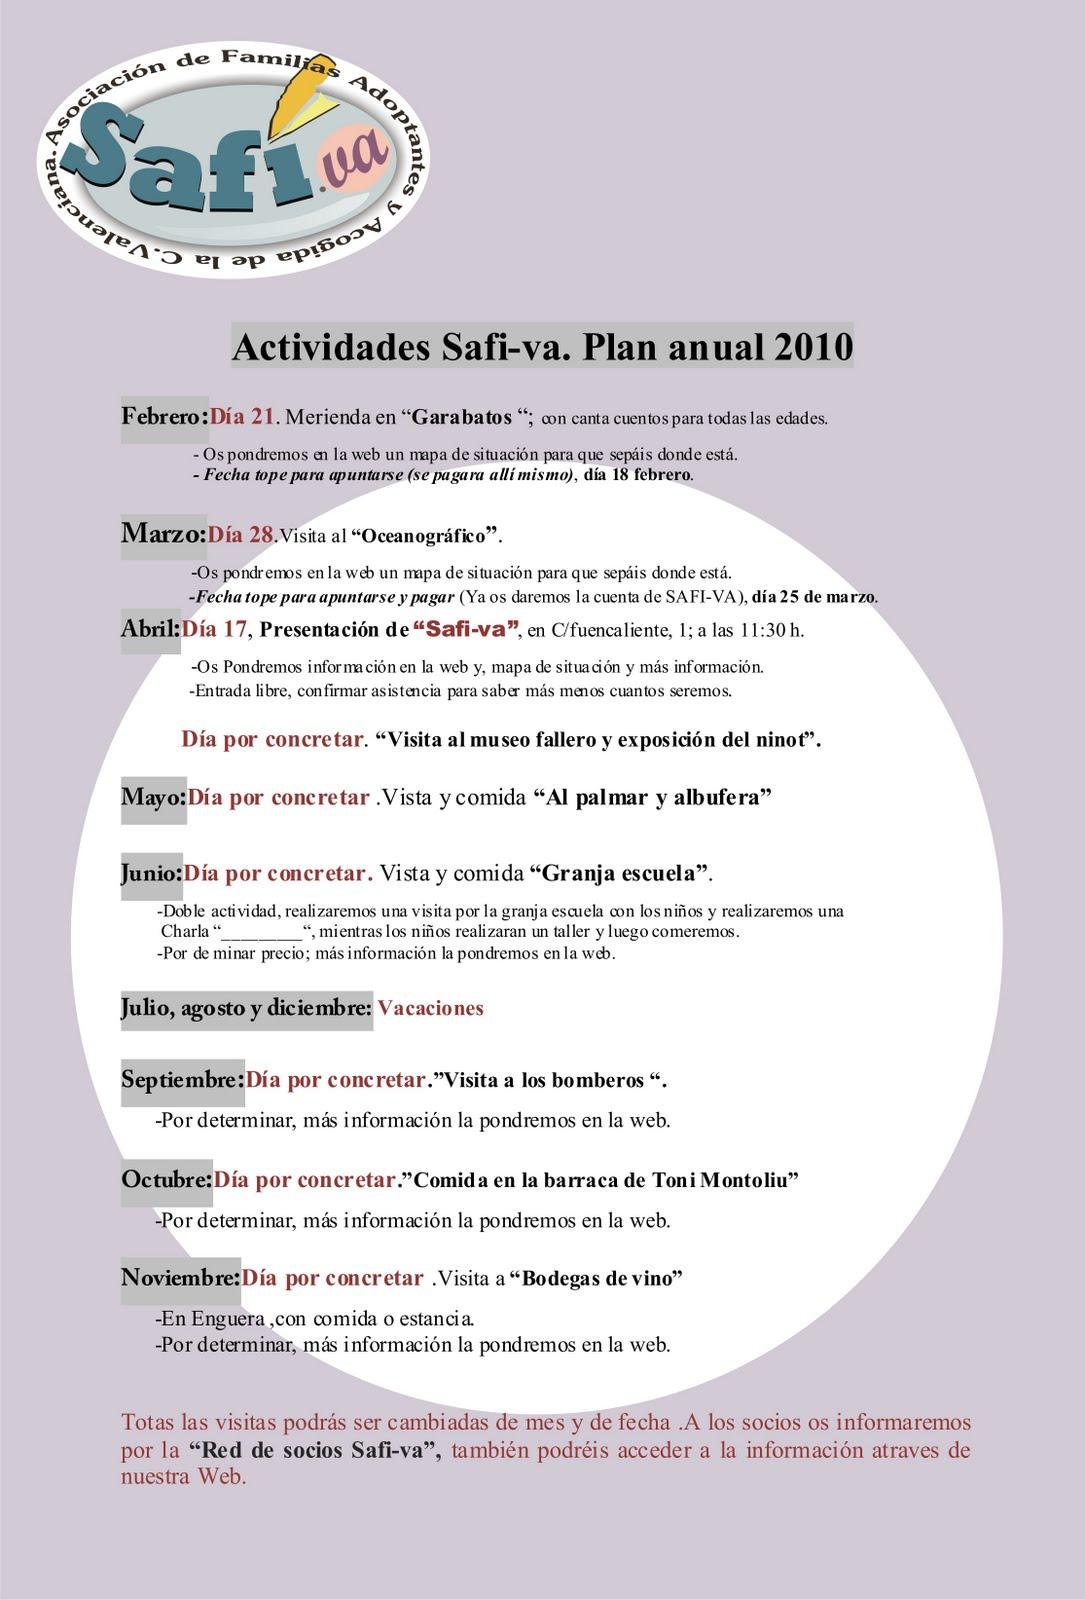 [actividades+2010.jpg]